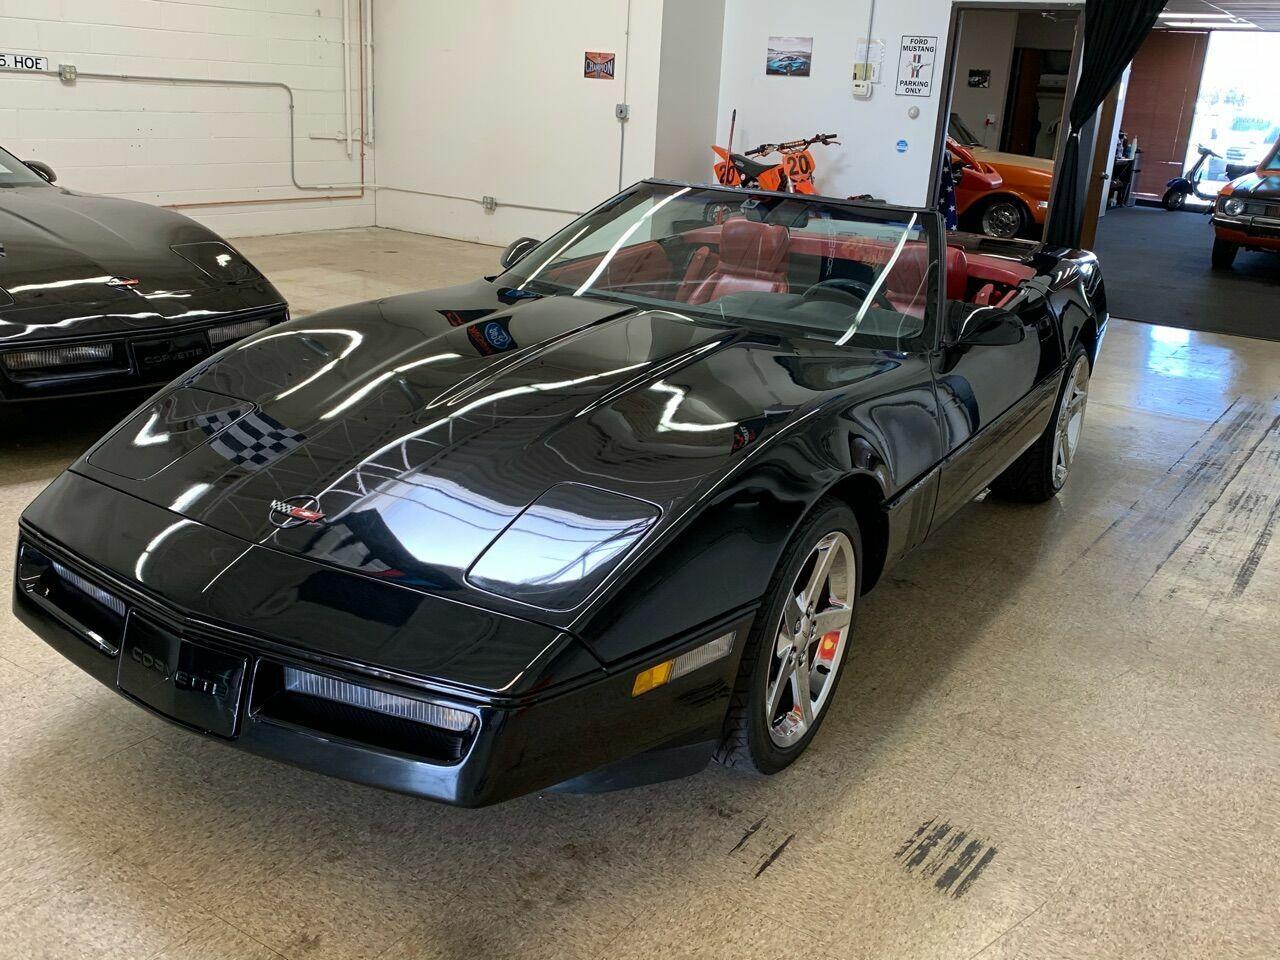 1990 Black Chevrolet Corvette Convertible    C4 Corvette Photo 5